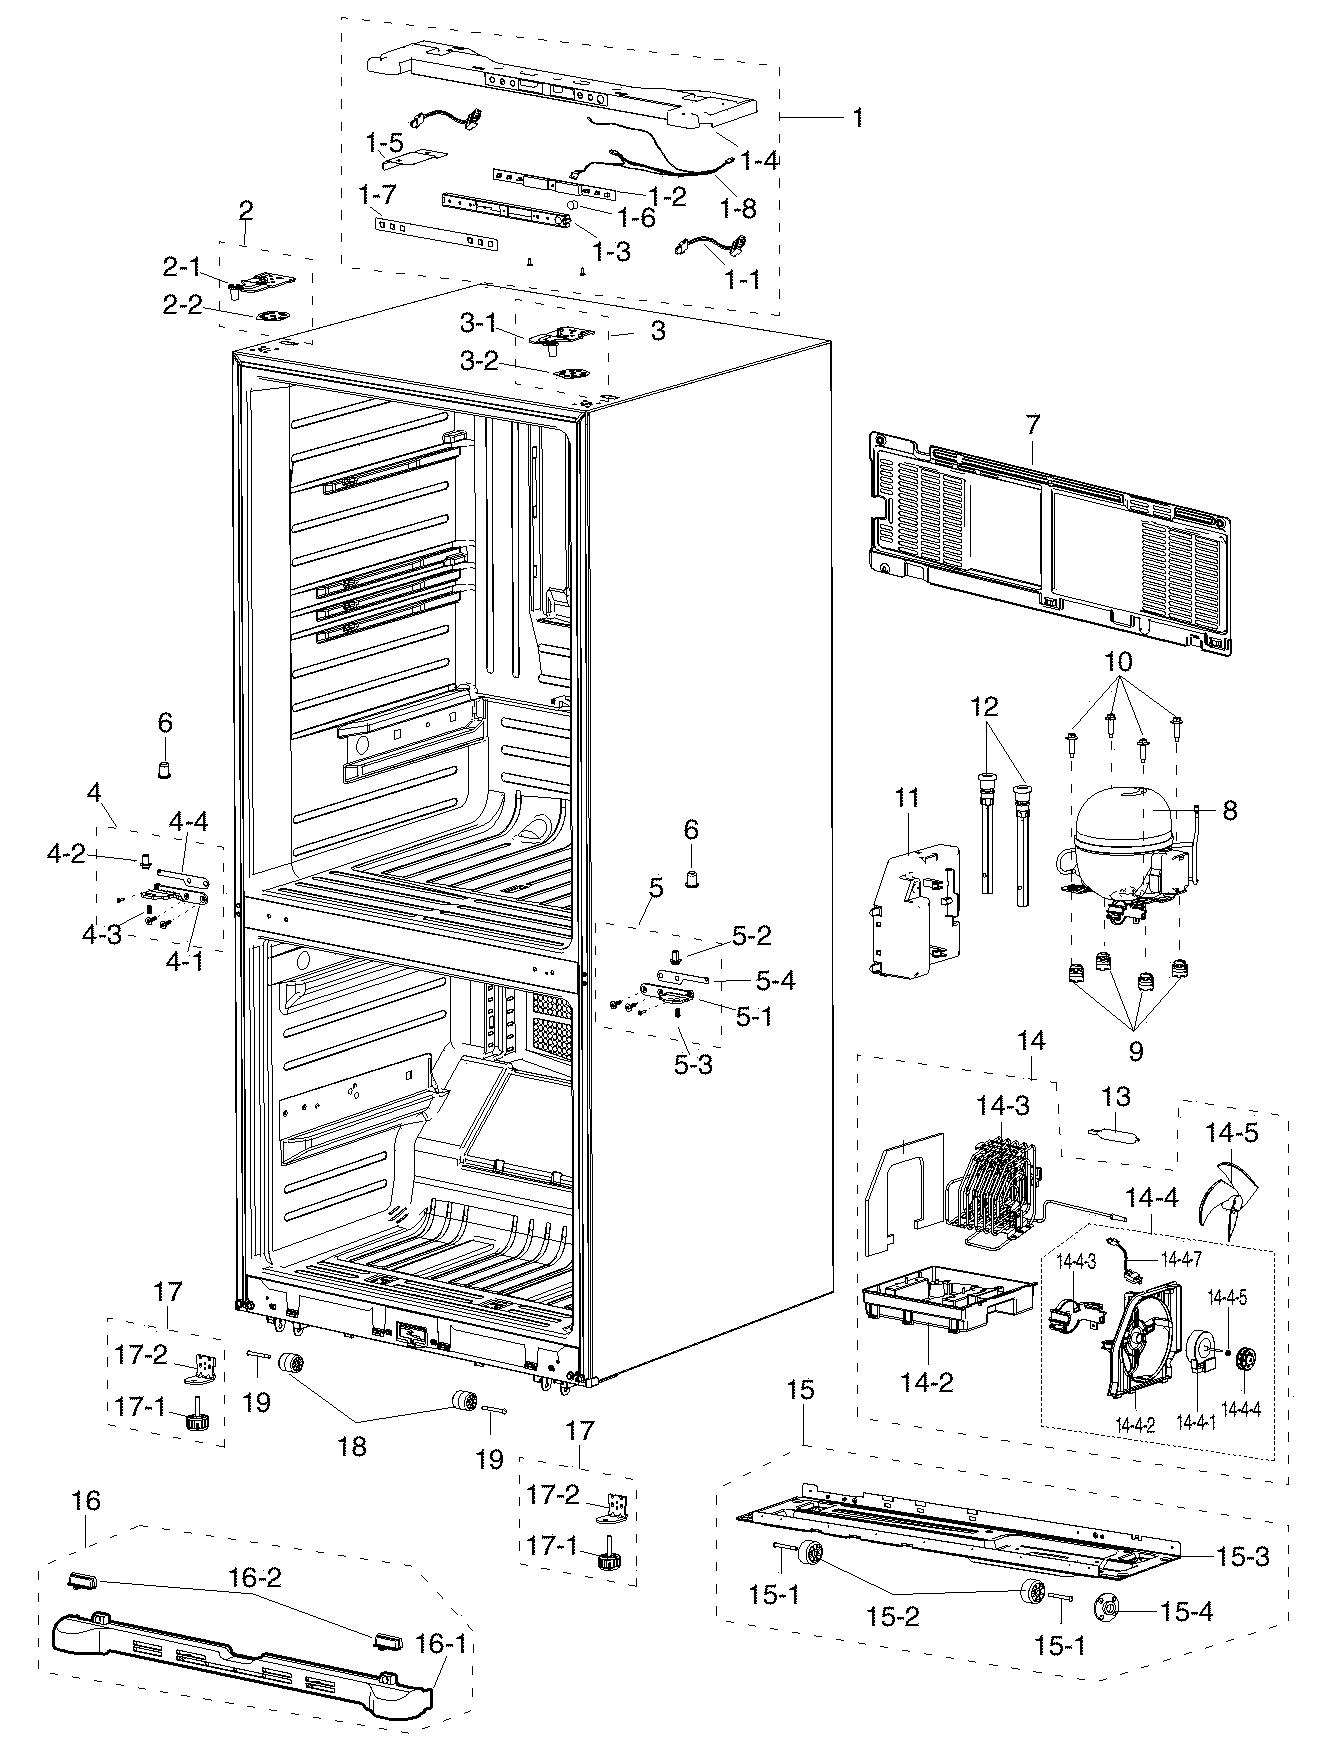 we have a samsung rf217acpn refrigerator  freezer  french door with bottom freezer   initially